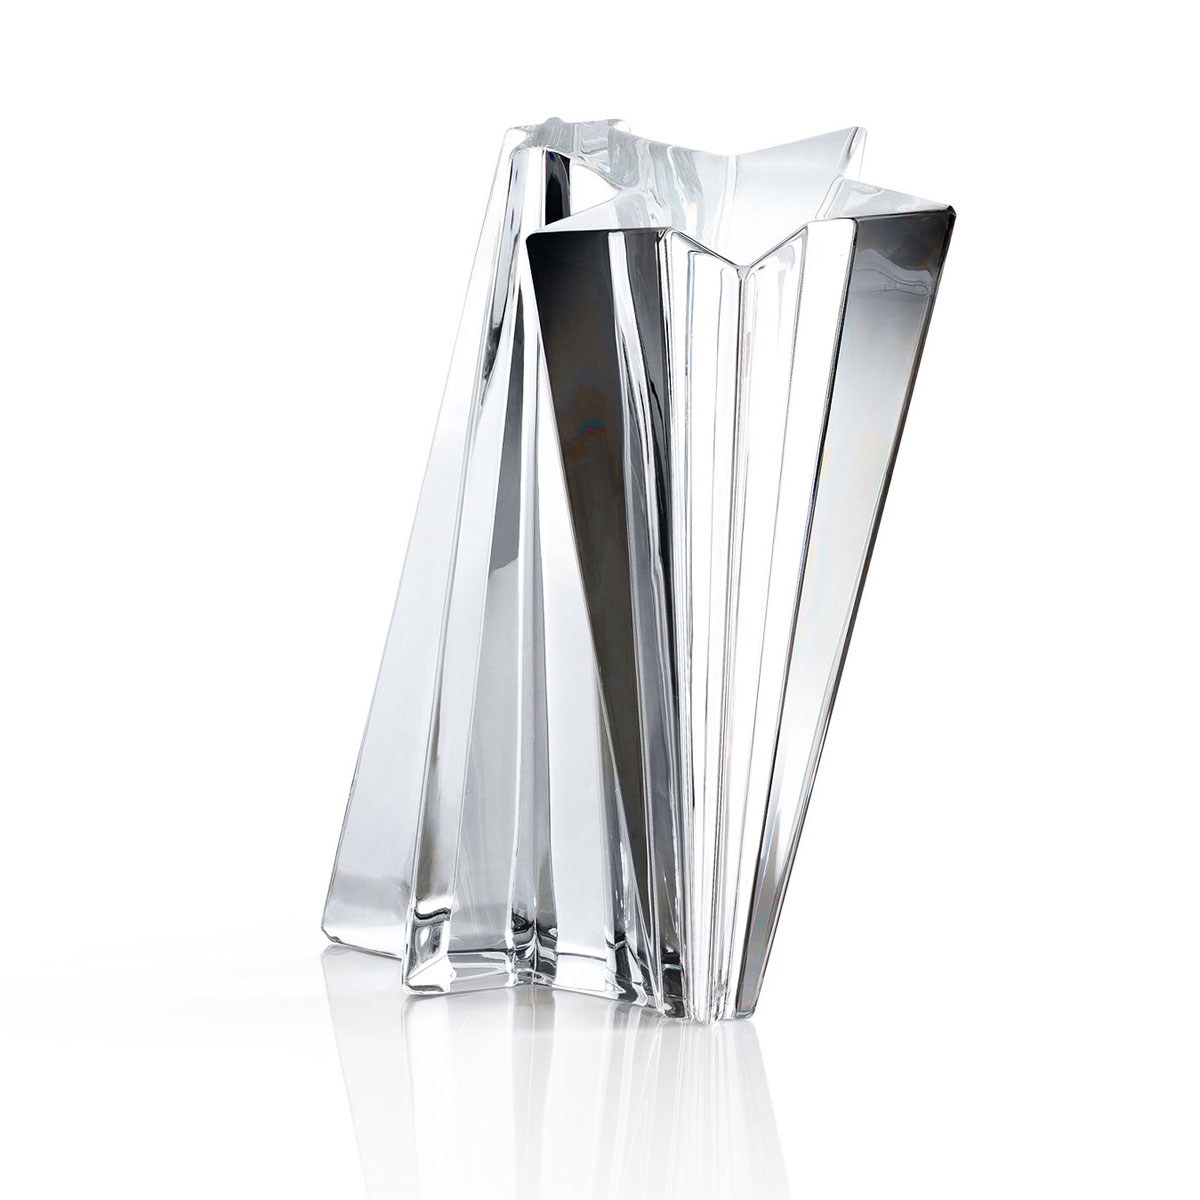 Baccarat Crystal, Shooting Star Trophy